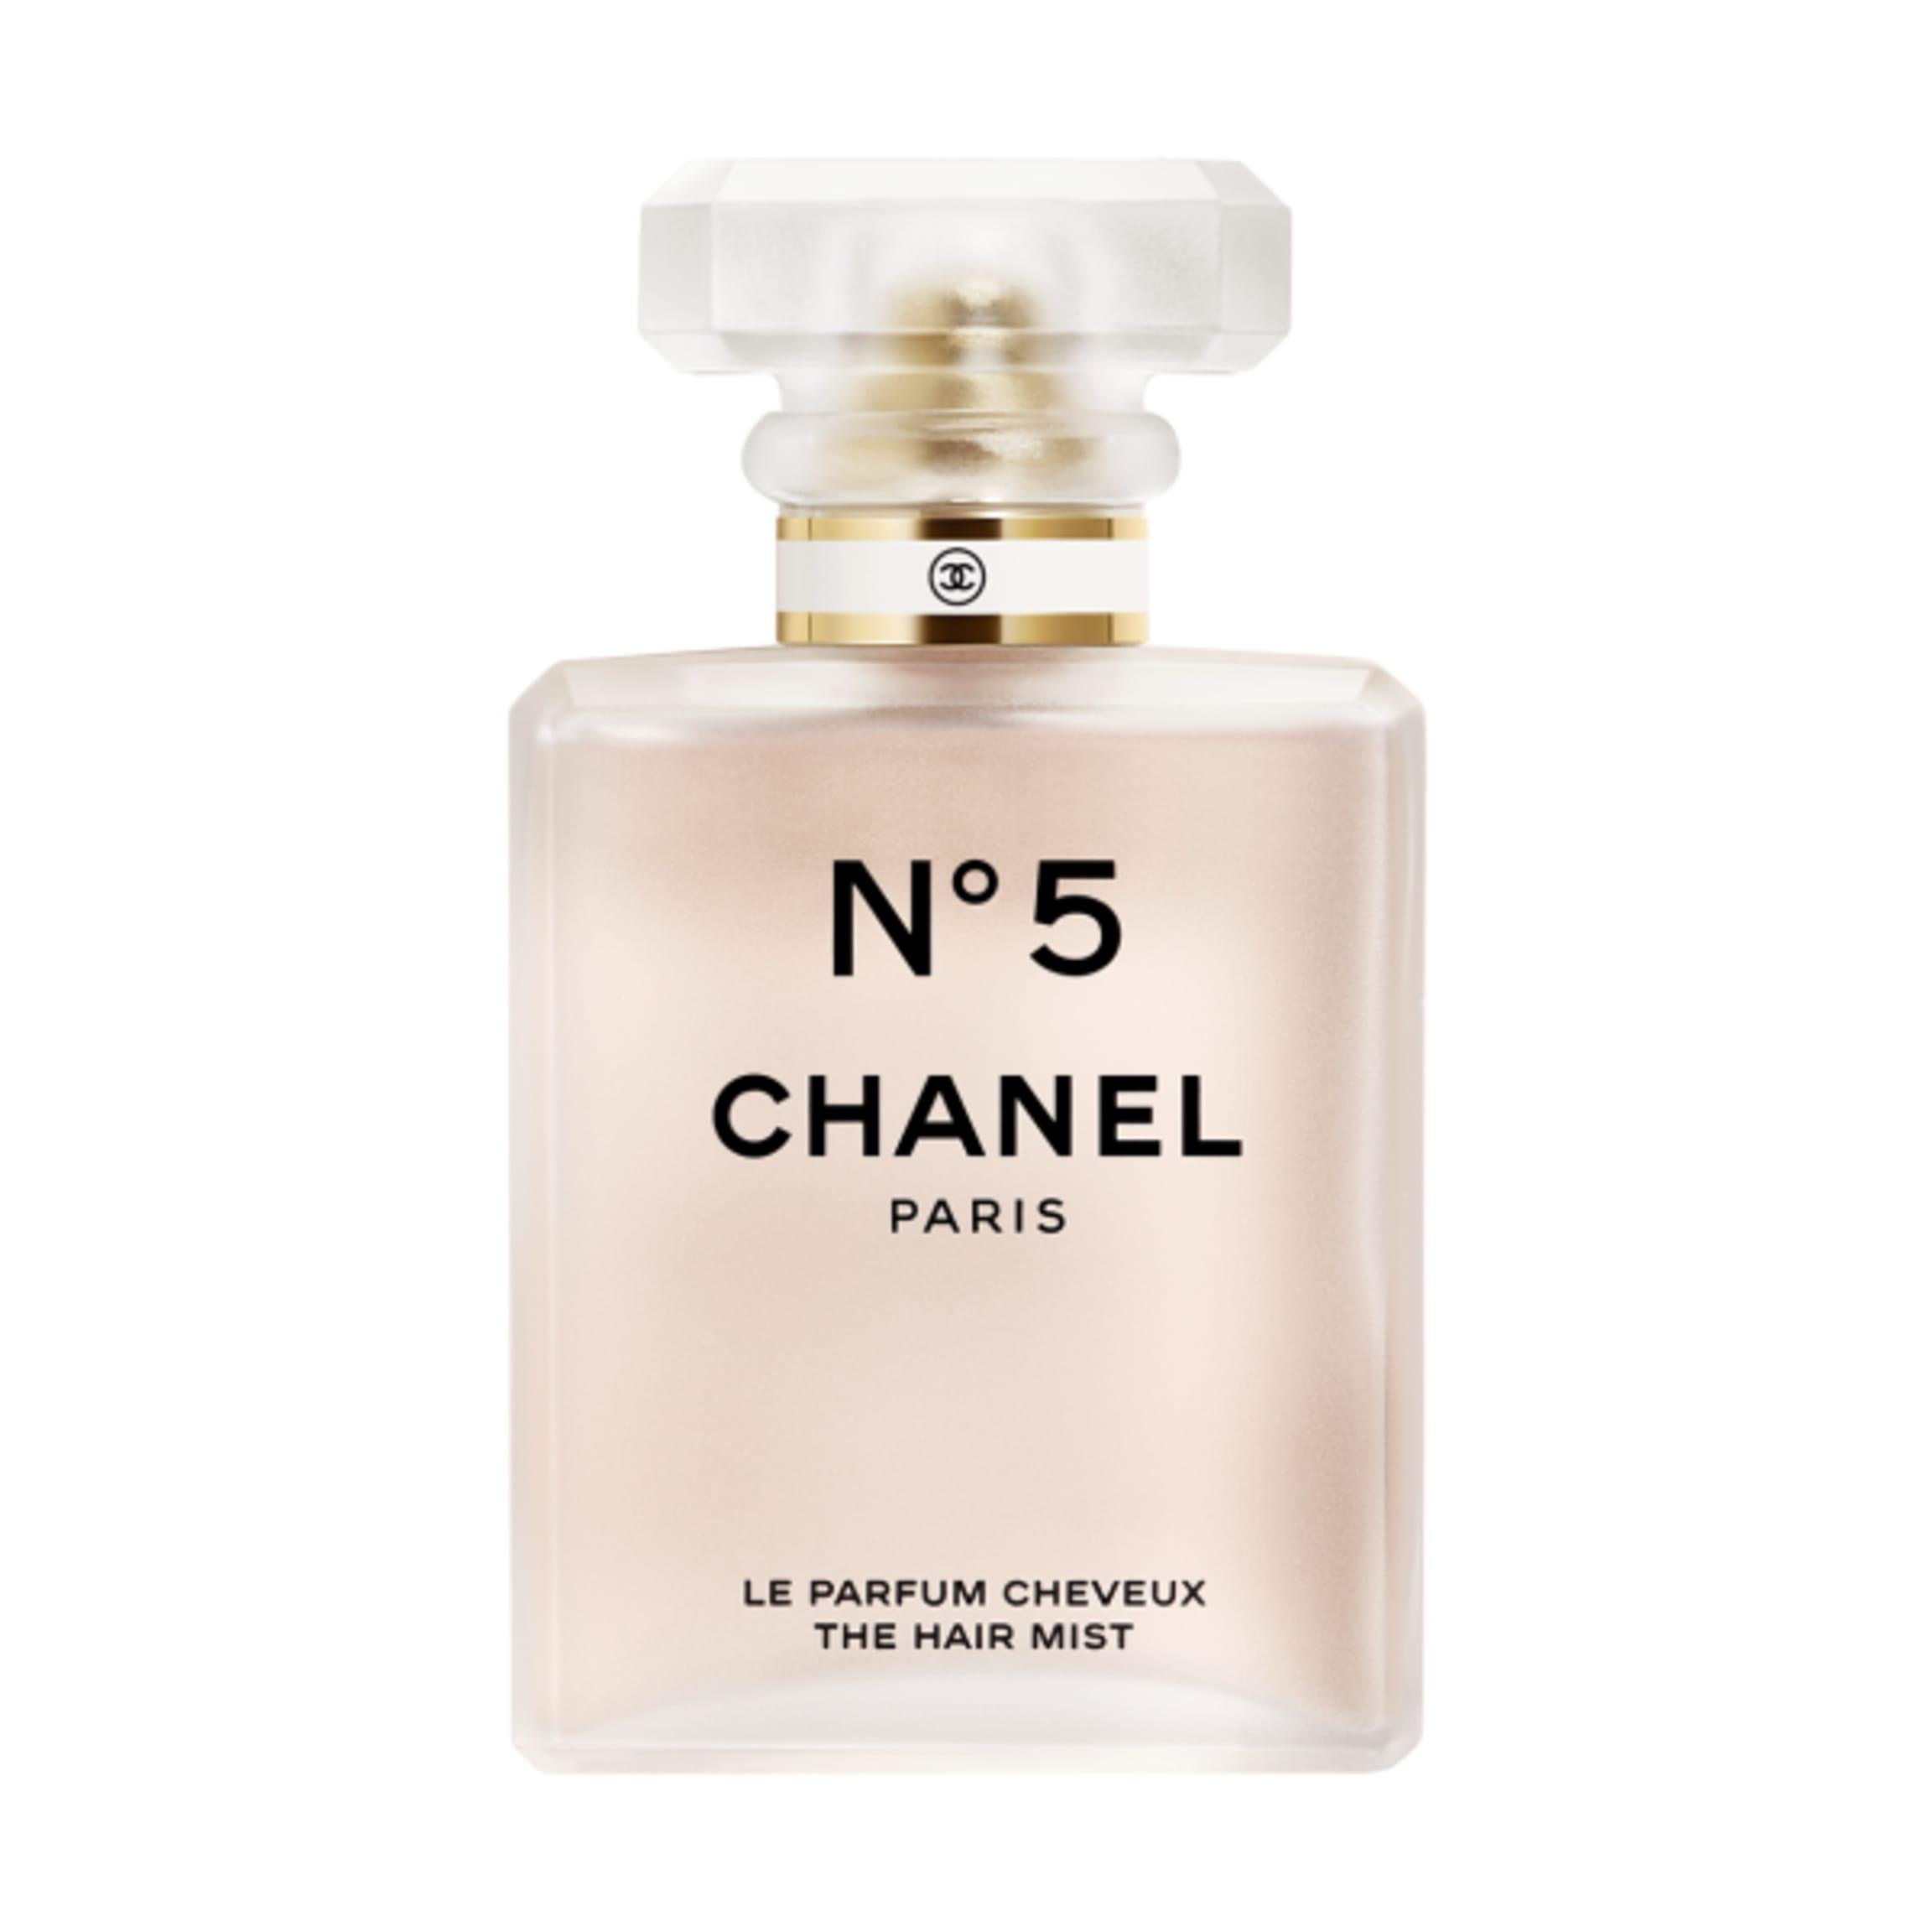 N 5 The Hair Mist Chanel